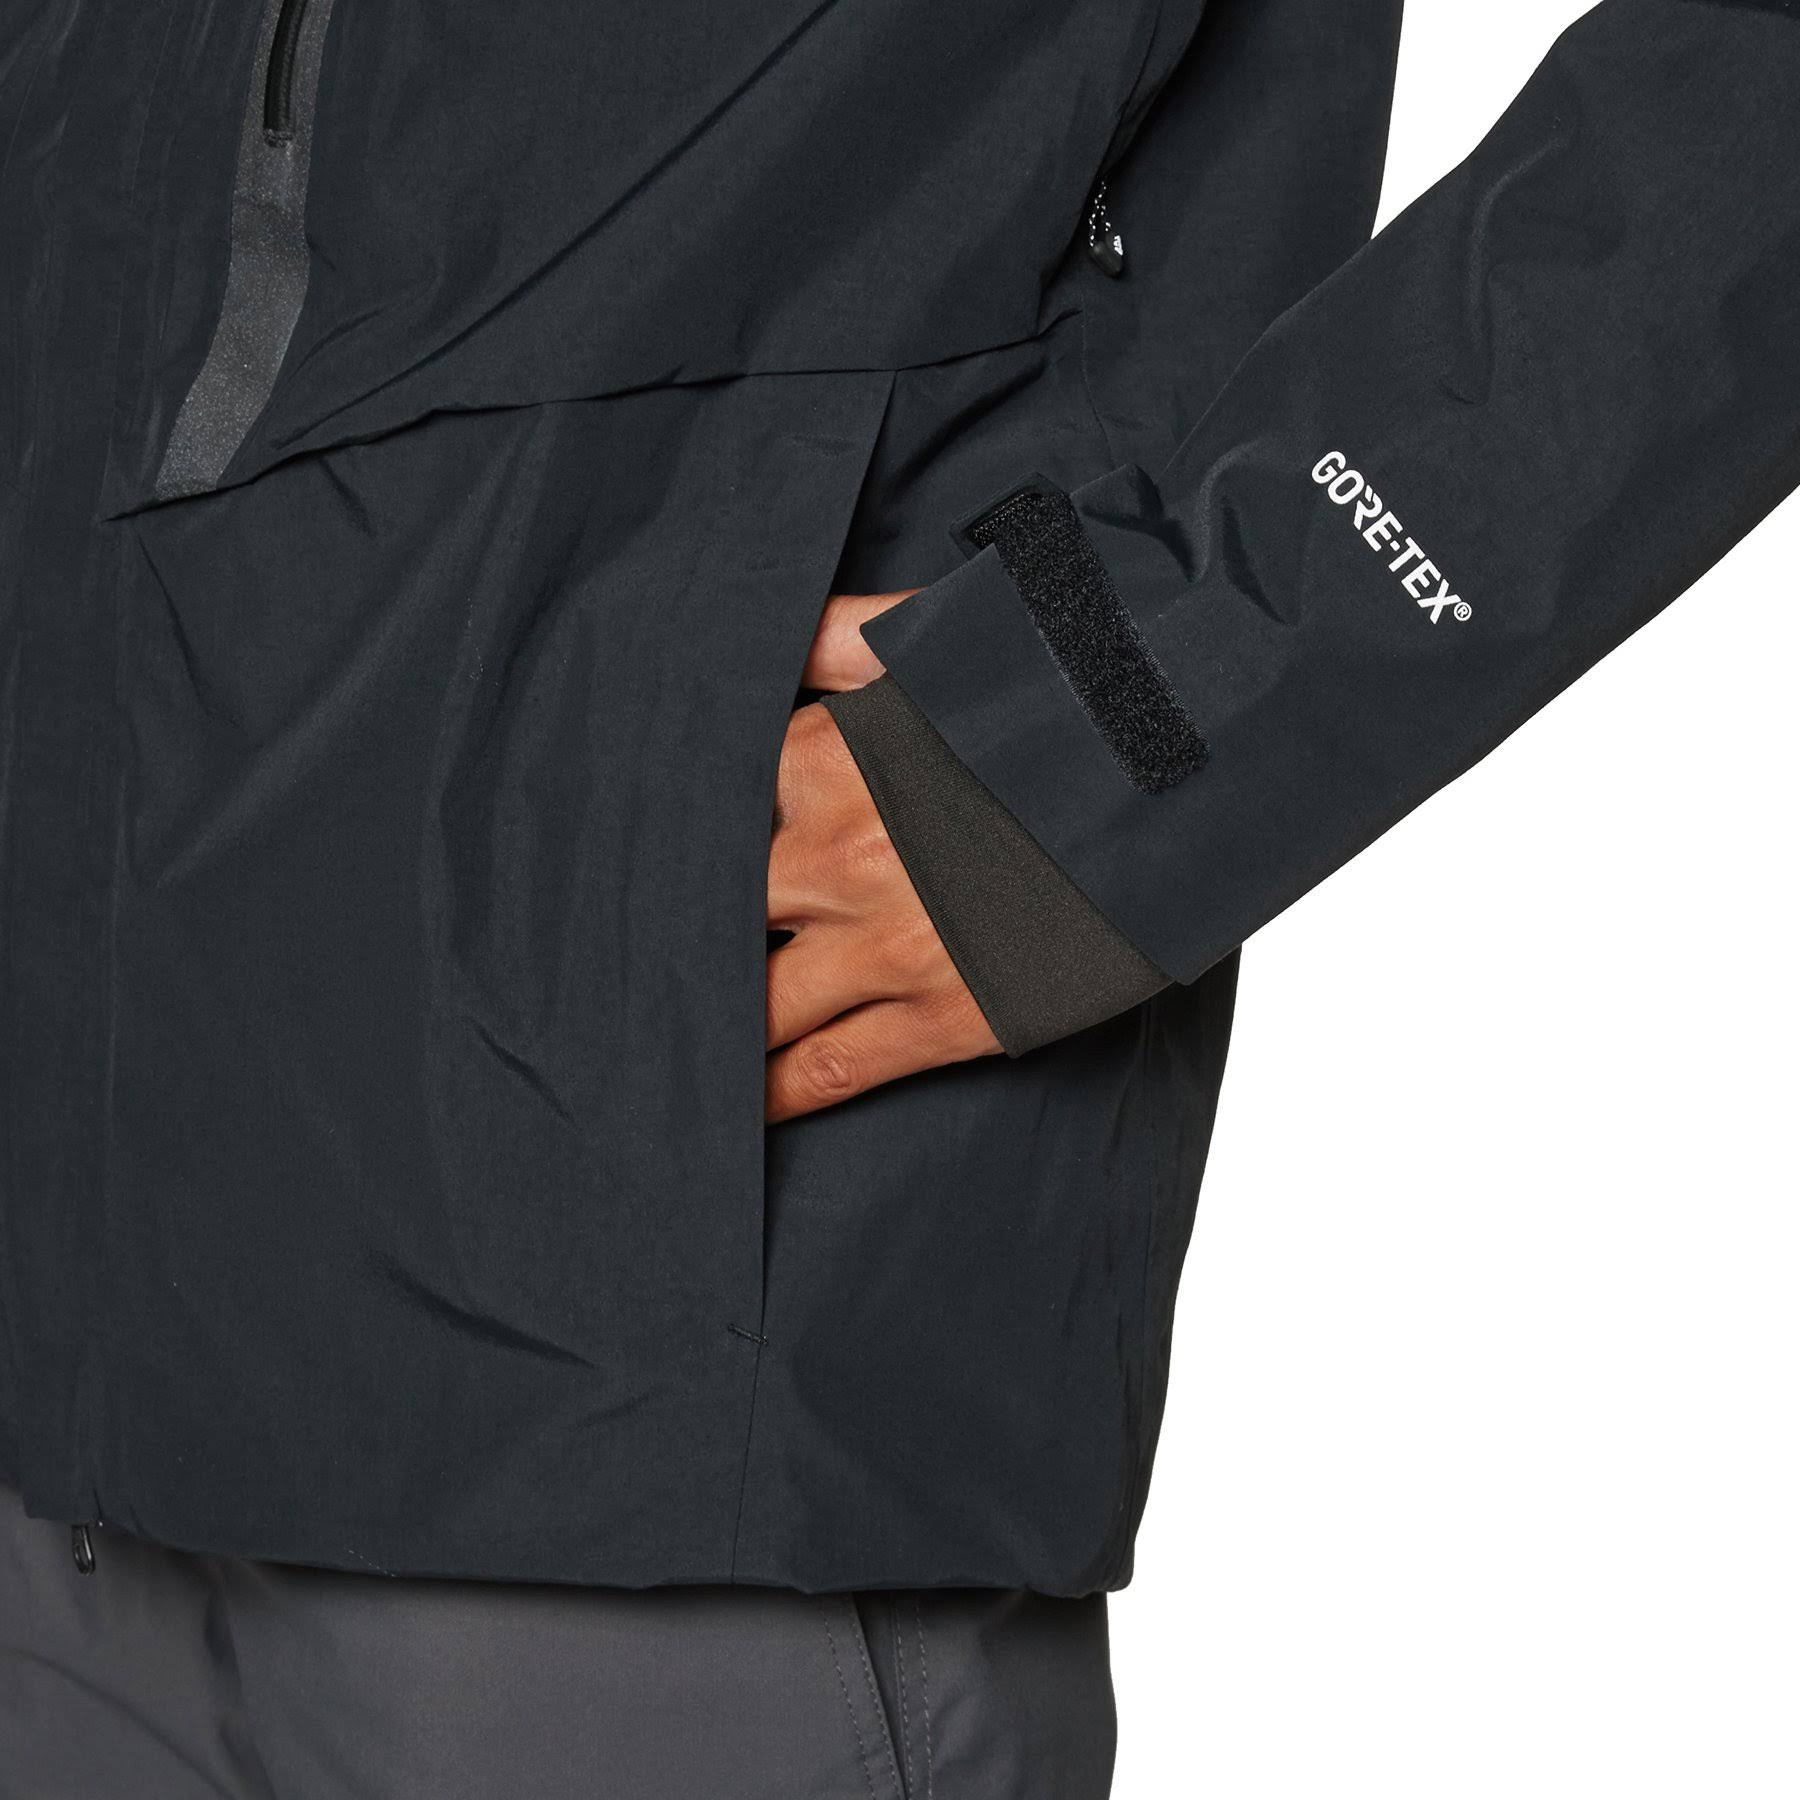 s Hombre Gore 686 Pequeño blk Jacket Negro tex L8w103 Gt fznw1W6T